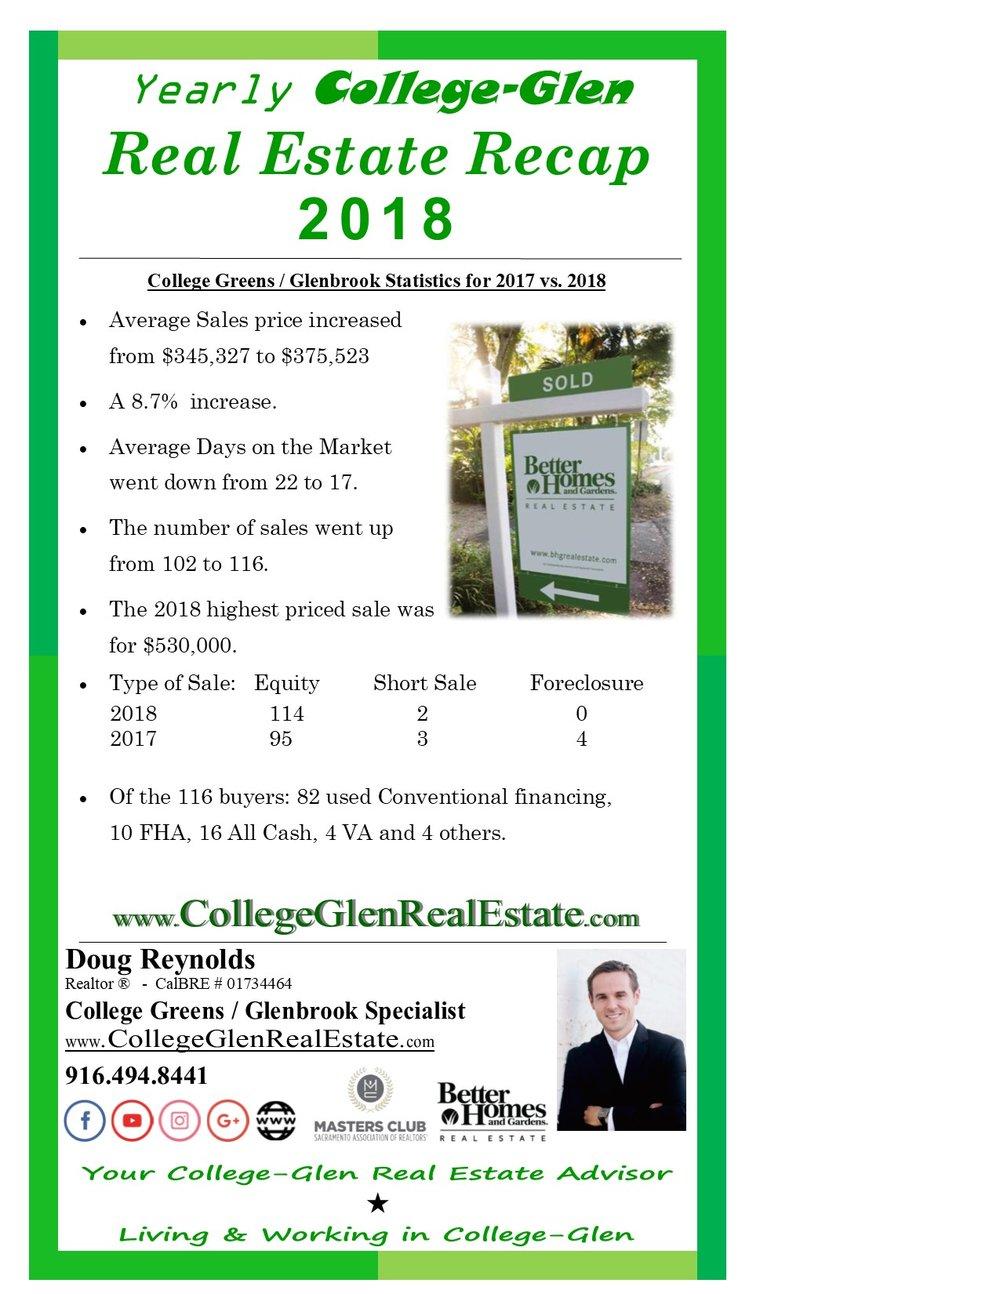 Jan 2019 CG mailer with calendar.jpg